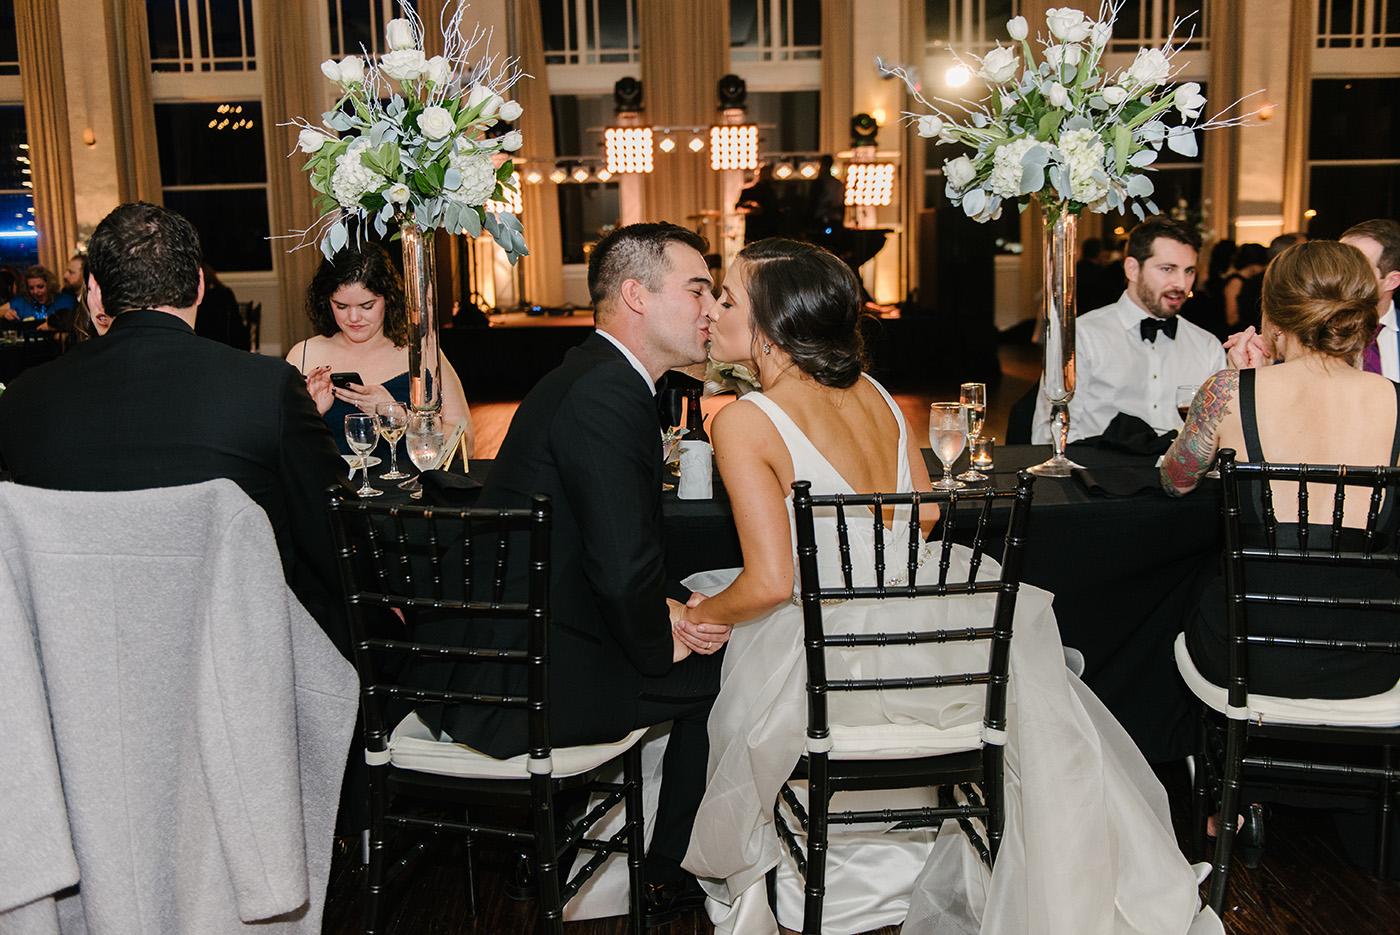 Dallas Wedding Planner - Winter Wedding at The Room on Main - Allday Events - 102.jpg